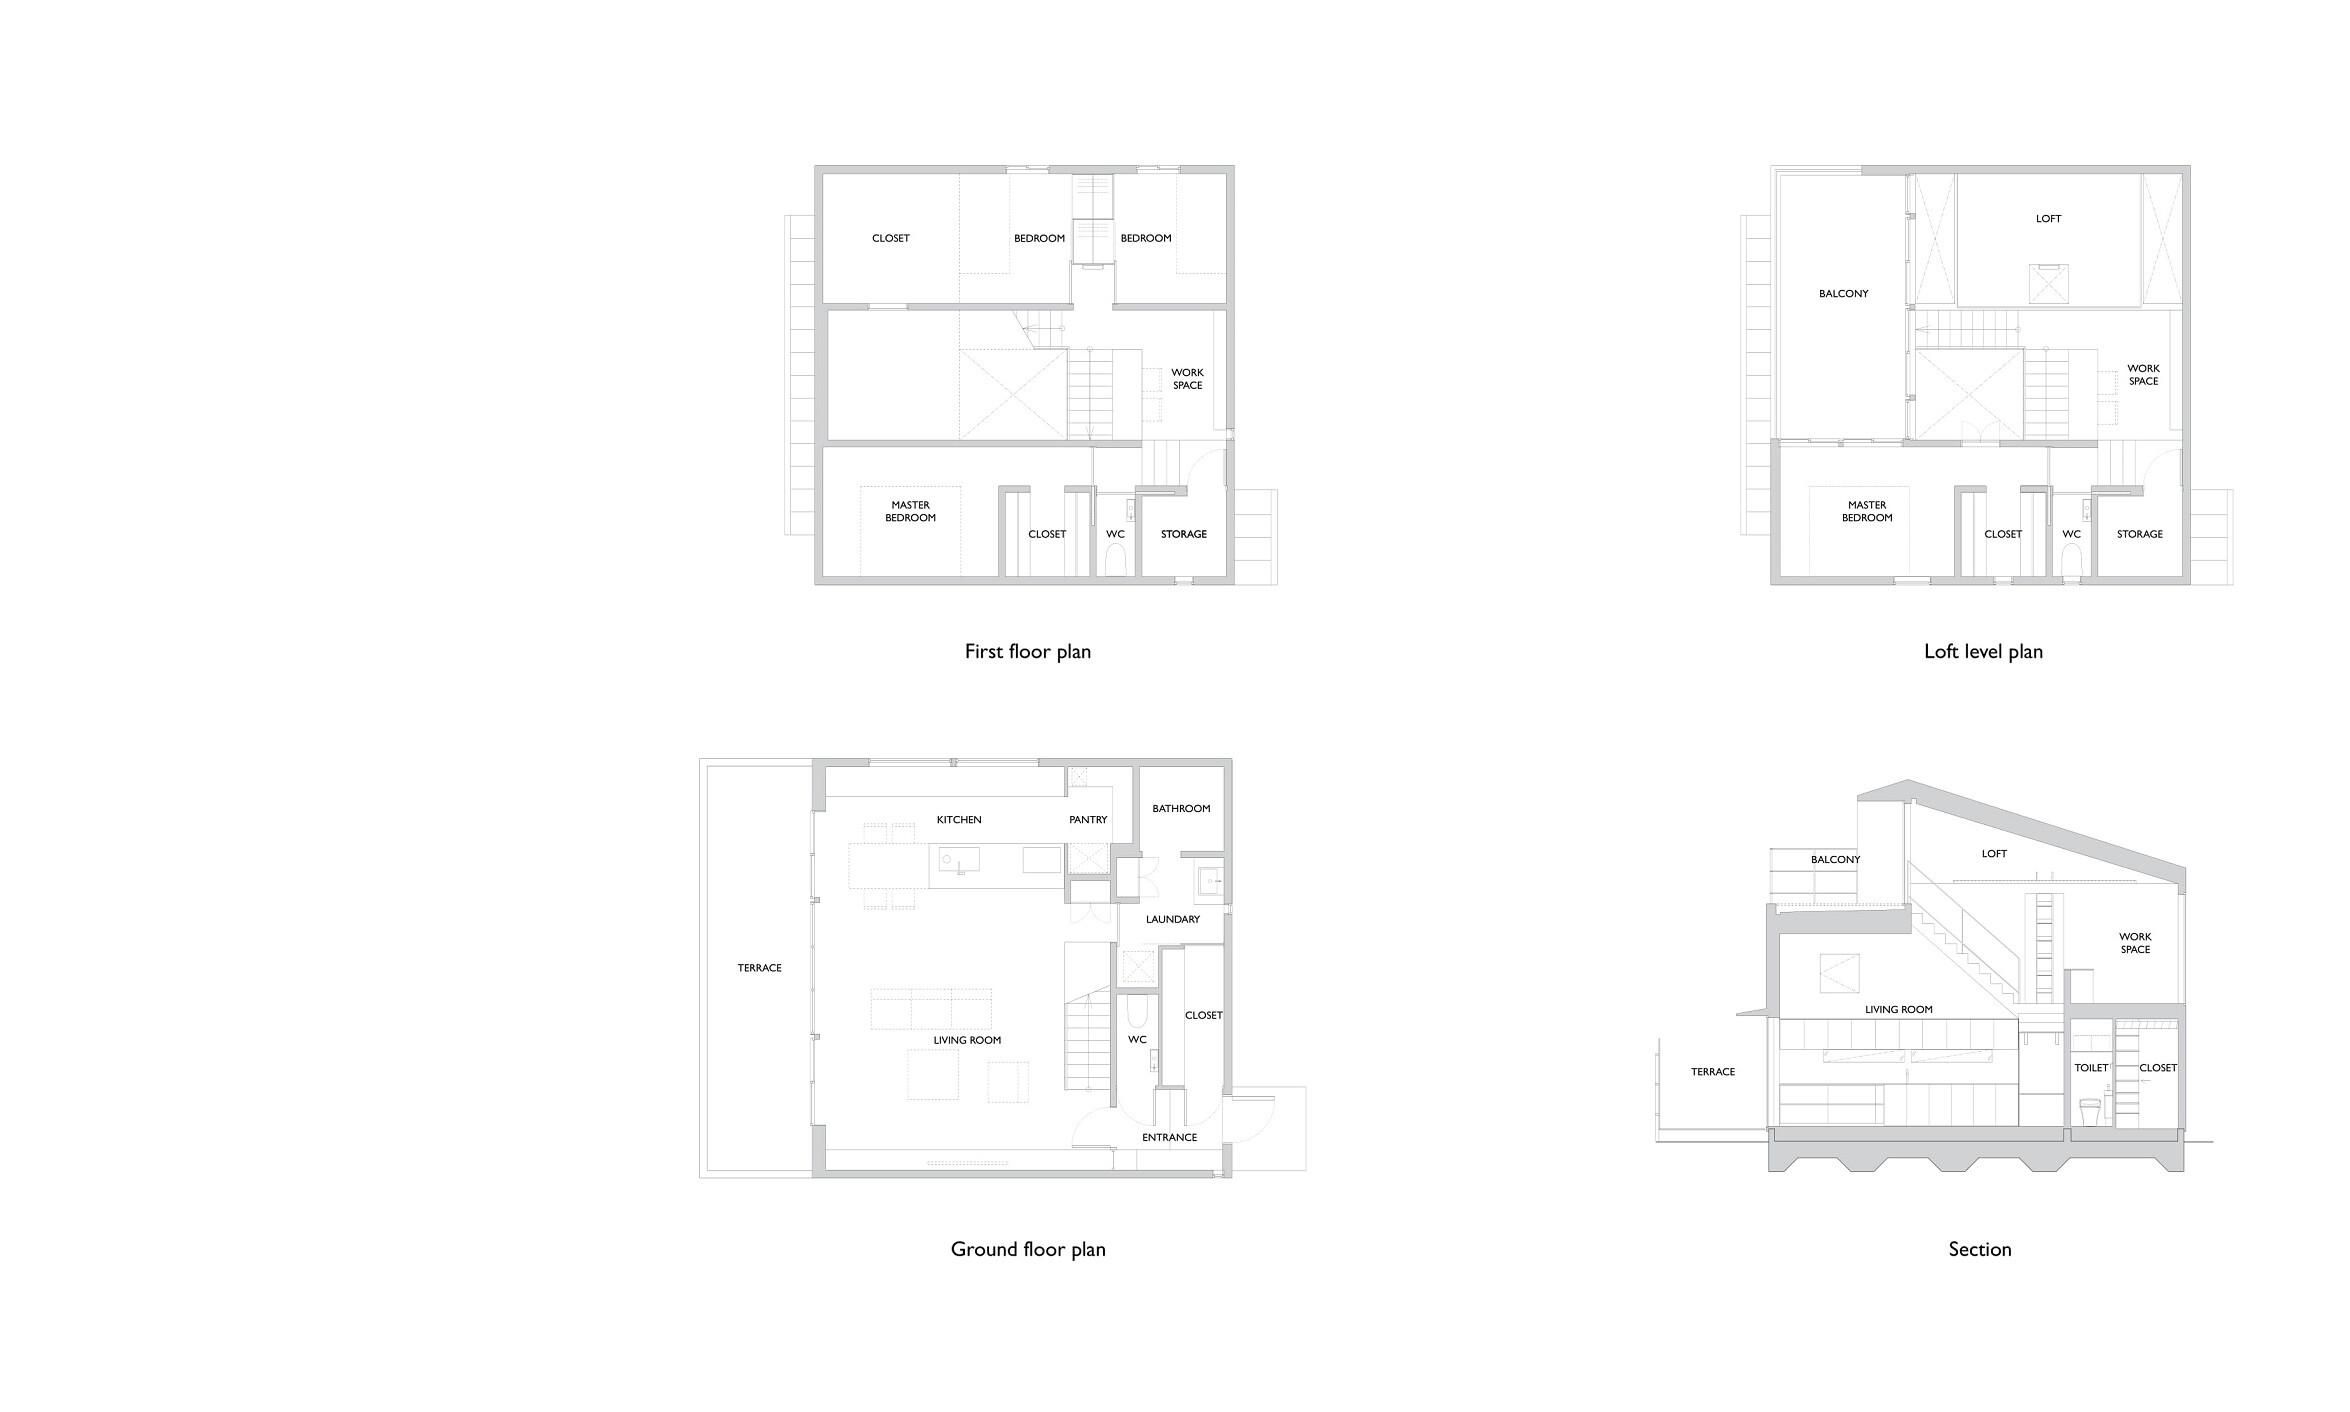 House In Todoroki Floor Plan Section Par Marque Archello